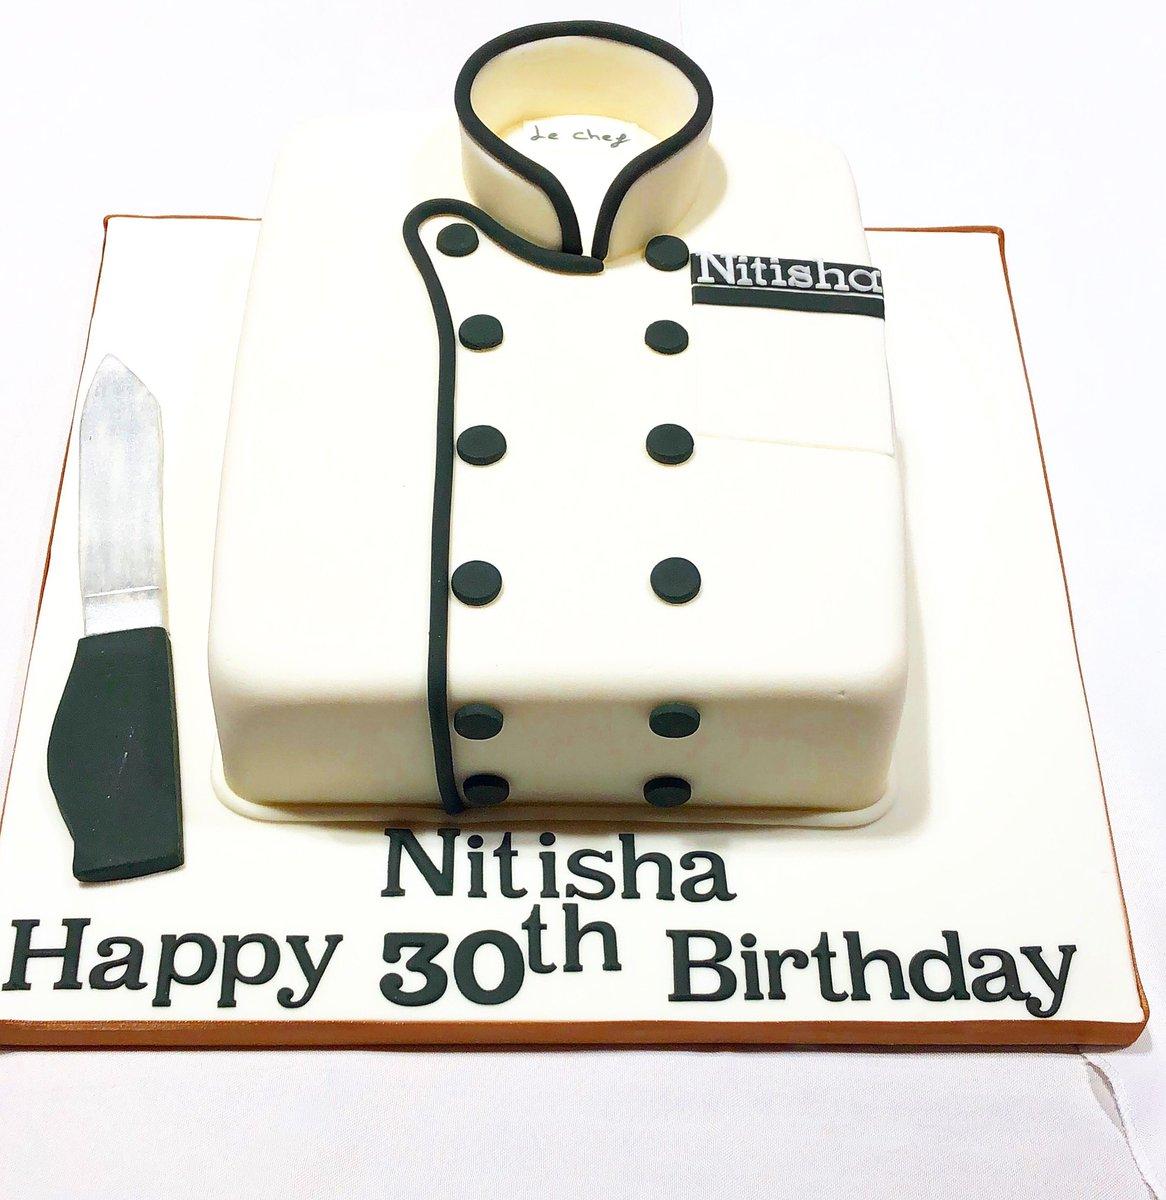 Enjoyable Nitisha Patel On Twitter The Cake My Family Surprised Me With At Personalised Birthday Cards Petedlily Jamesorg